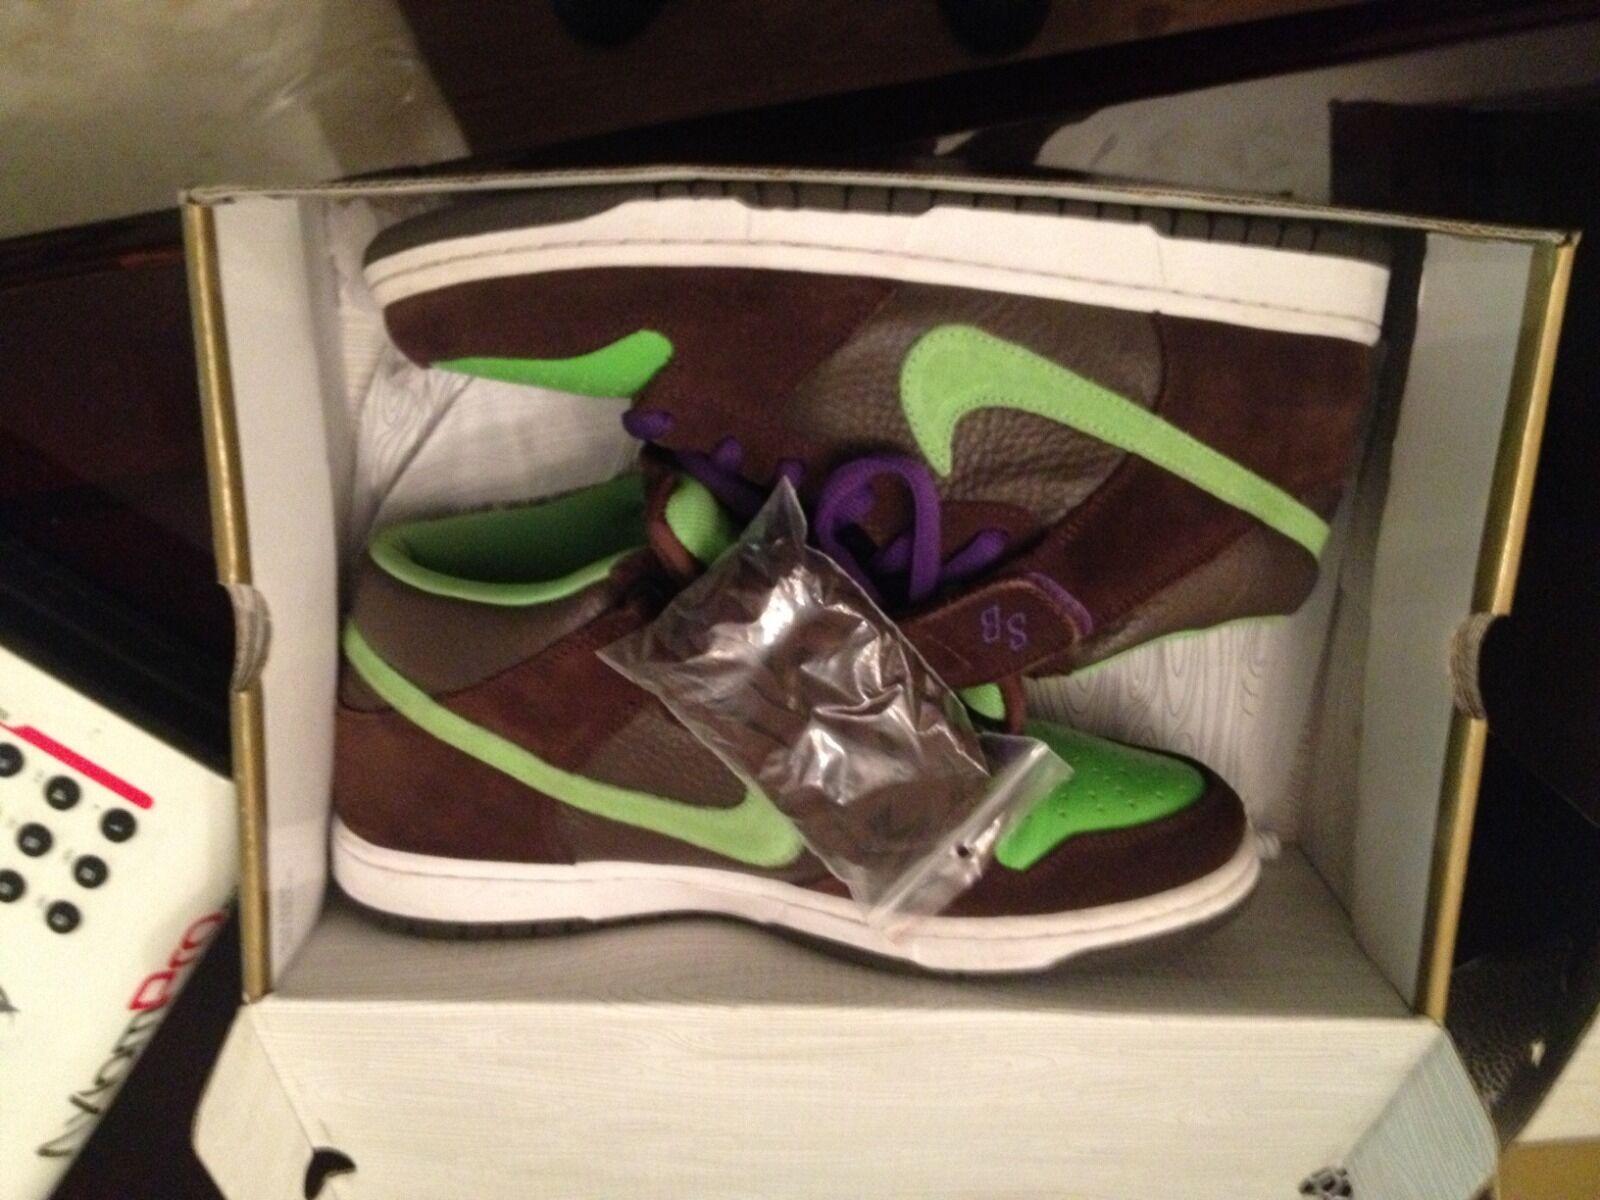 Donatello SB Dunks Mid size 11